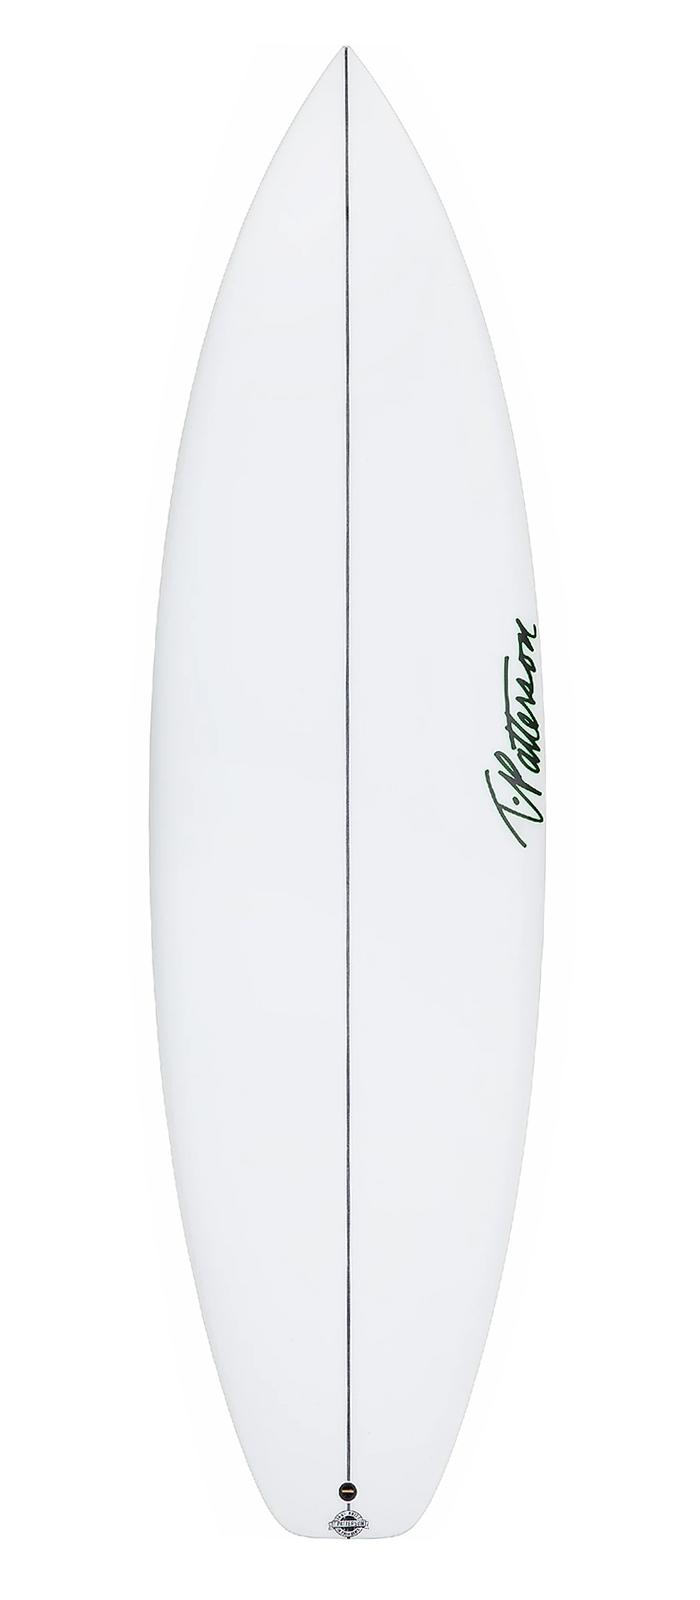 POOL PARTY - 1 surfboard model